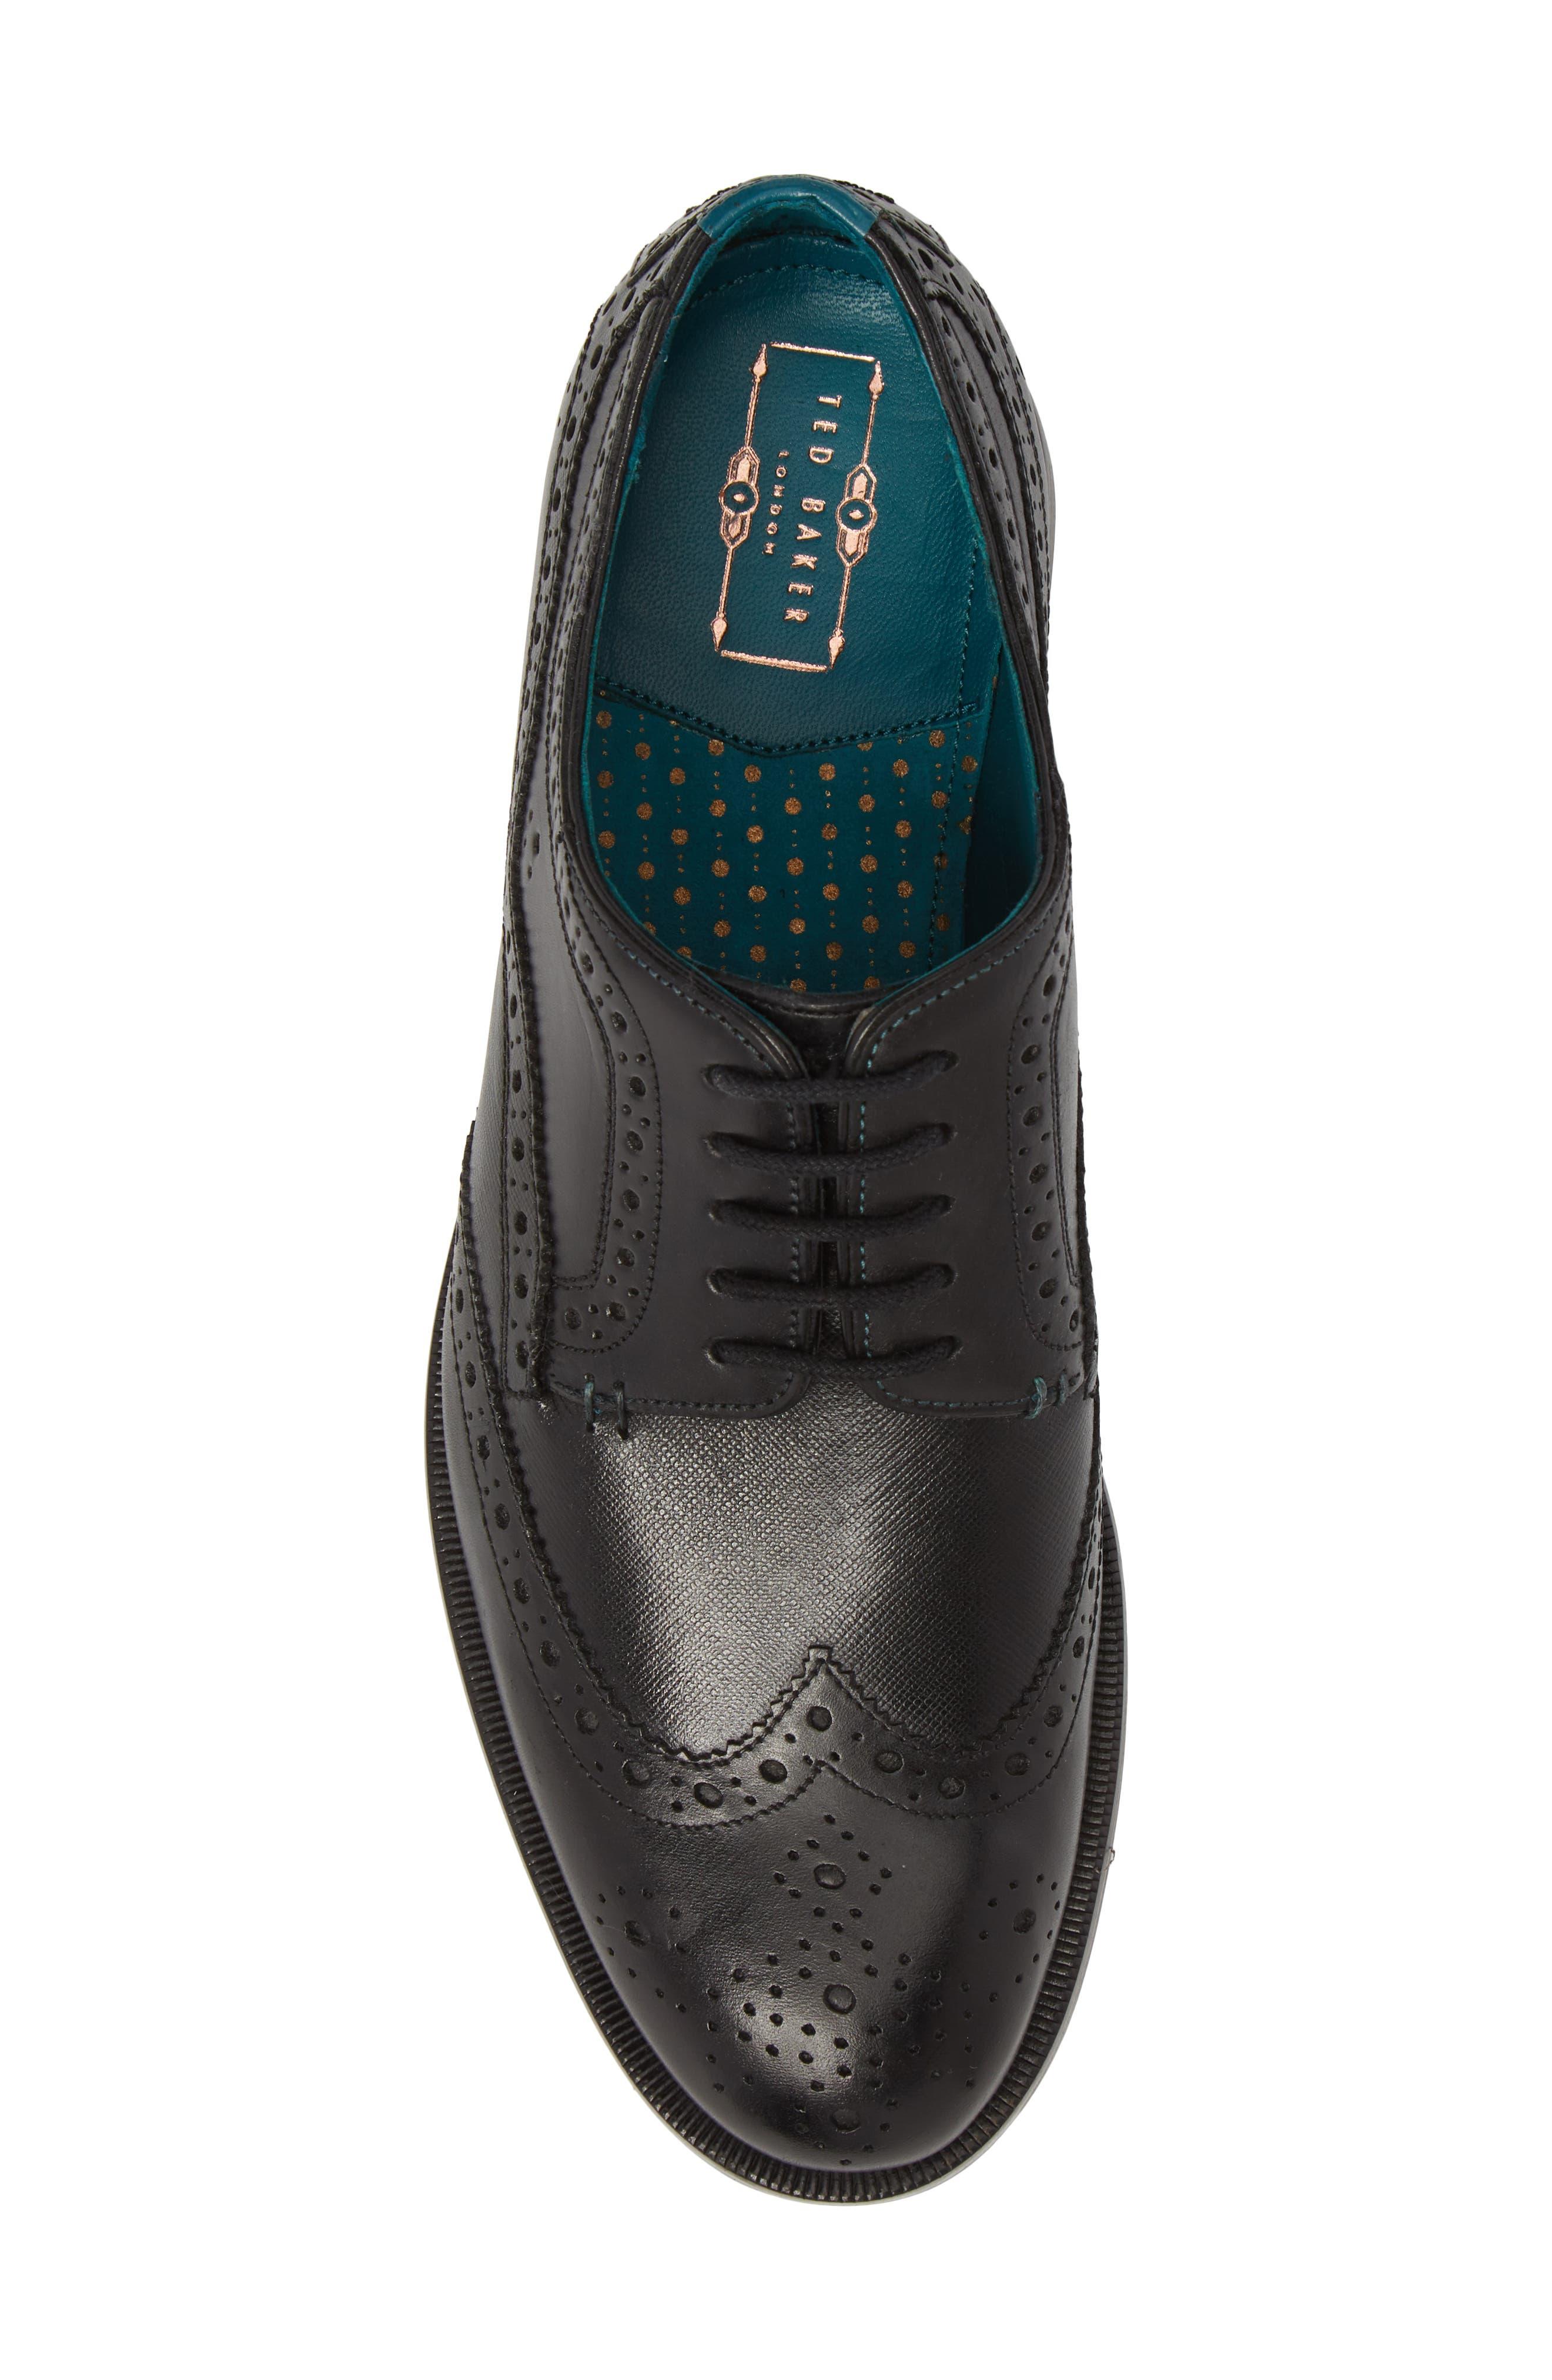 Senape Wingtip,                             Alternate thumbnail 3, color,                             Black Leather